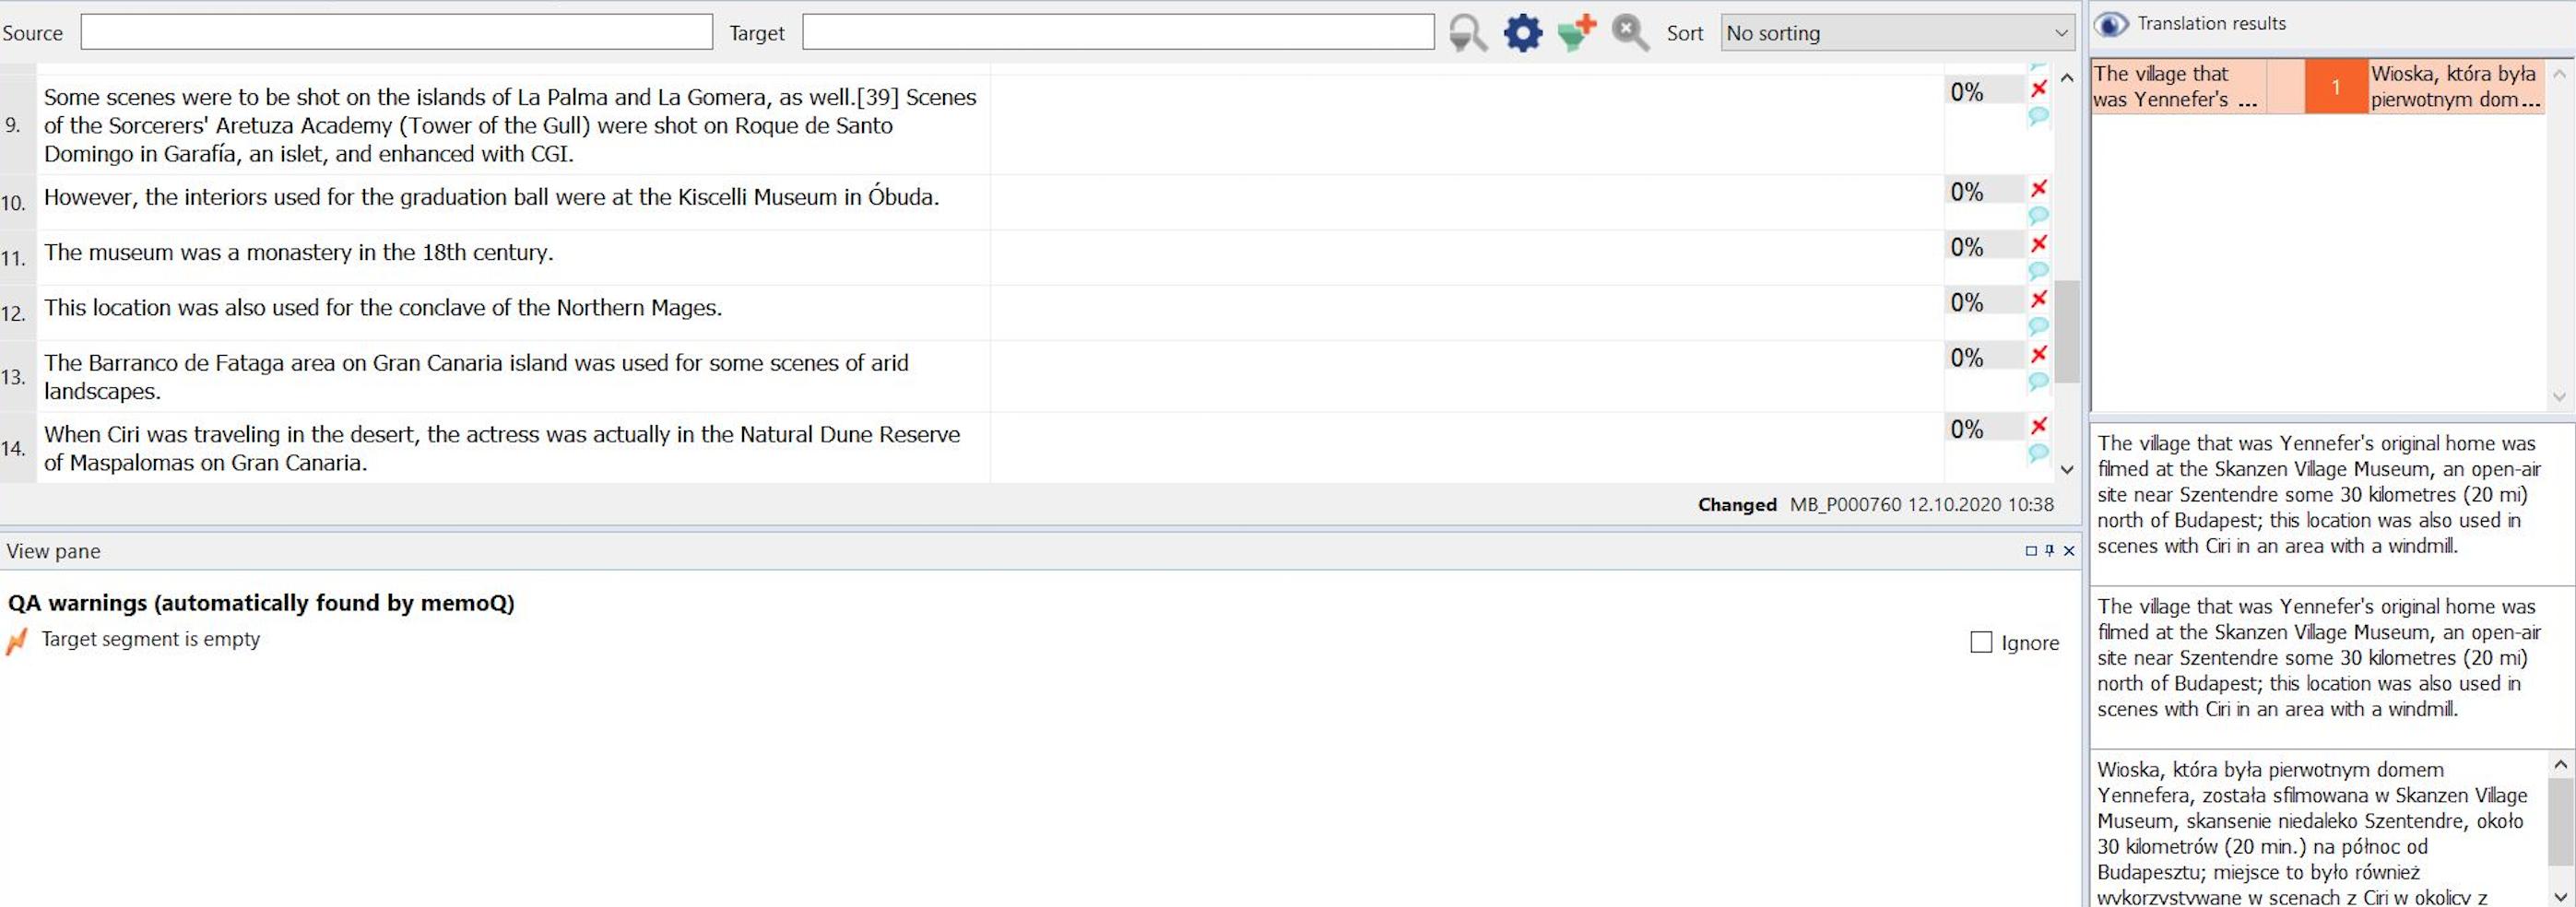 Example of memoq translation tool interface at work